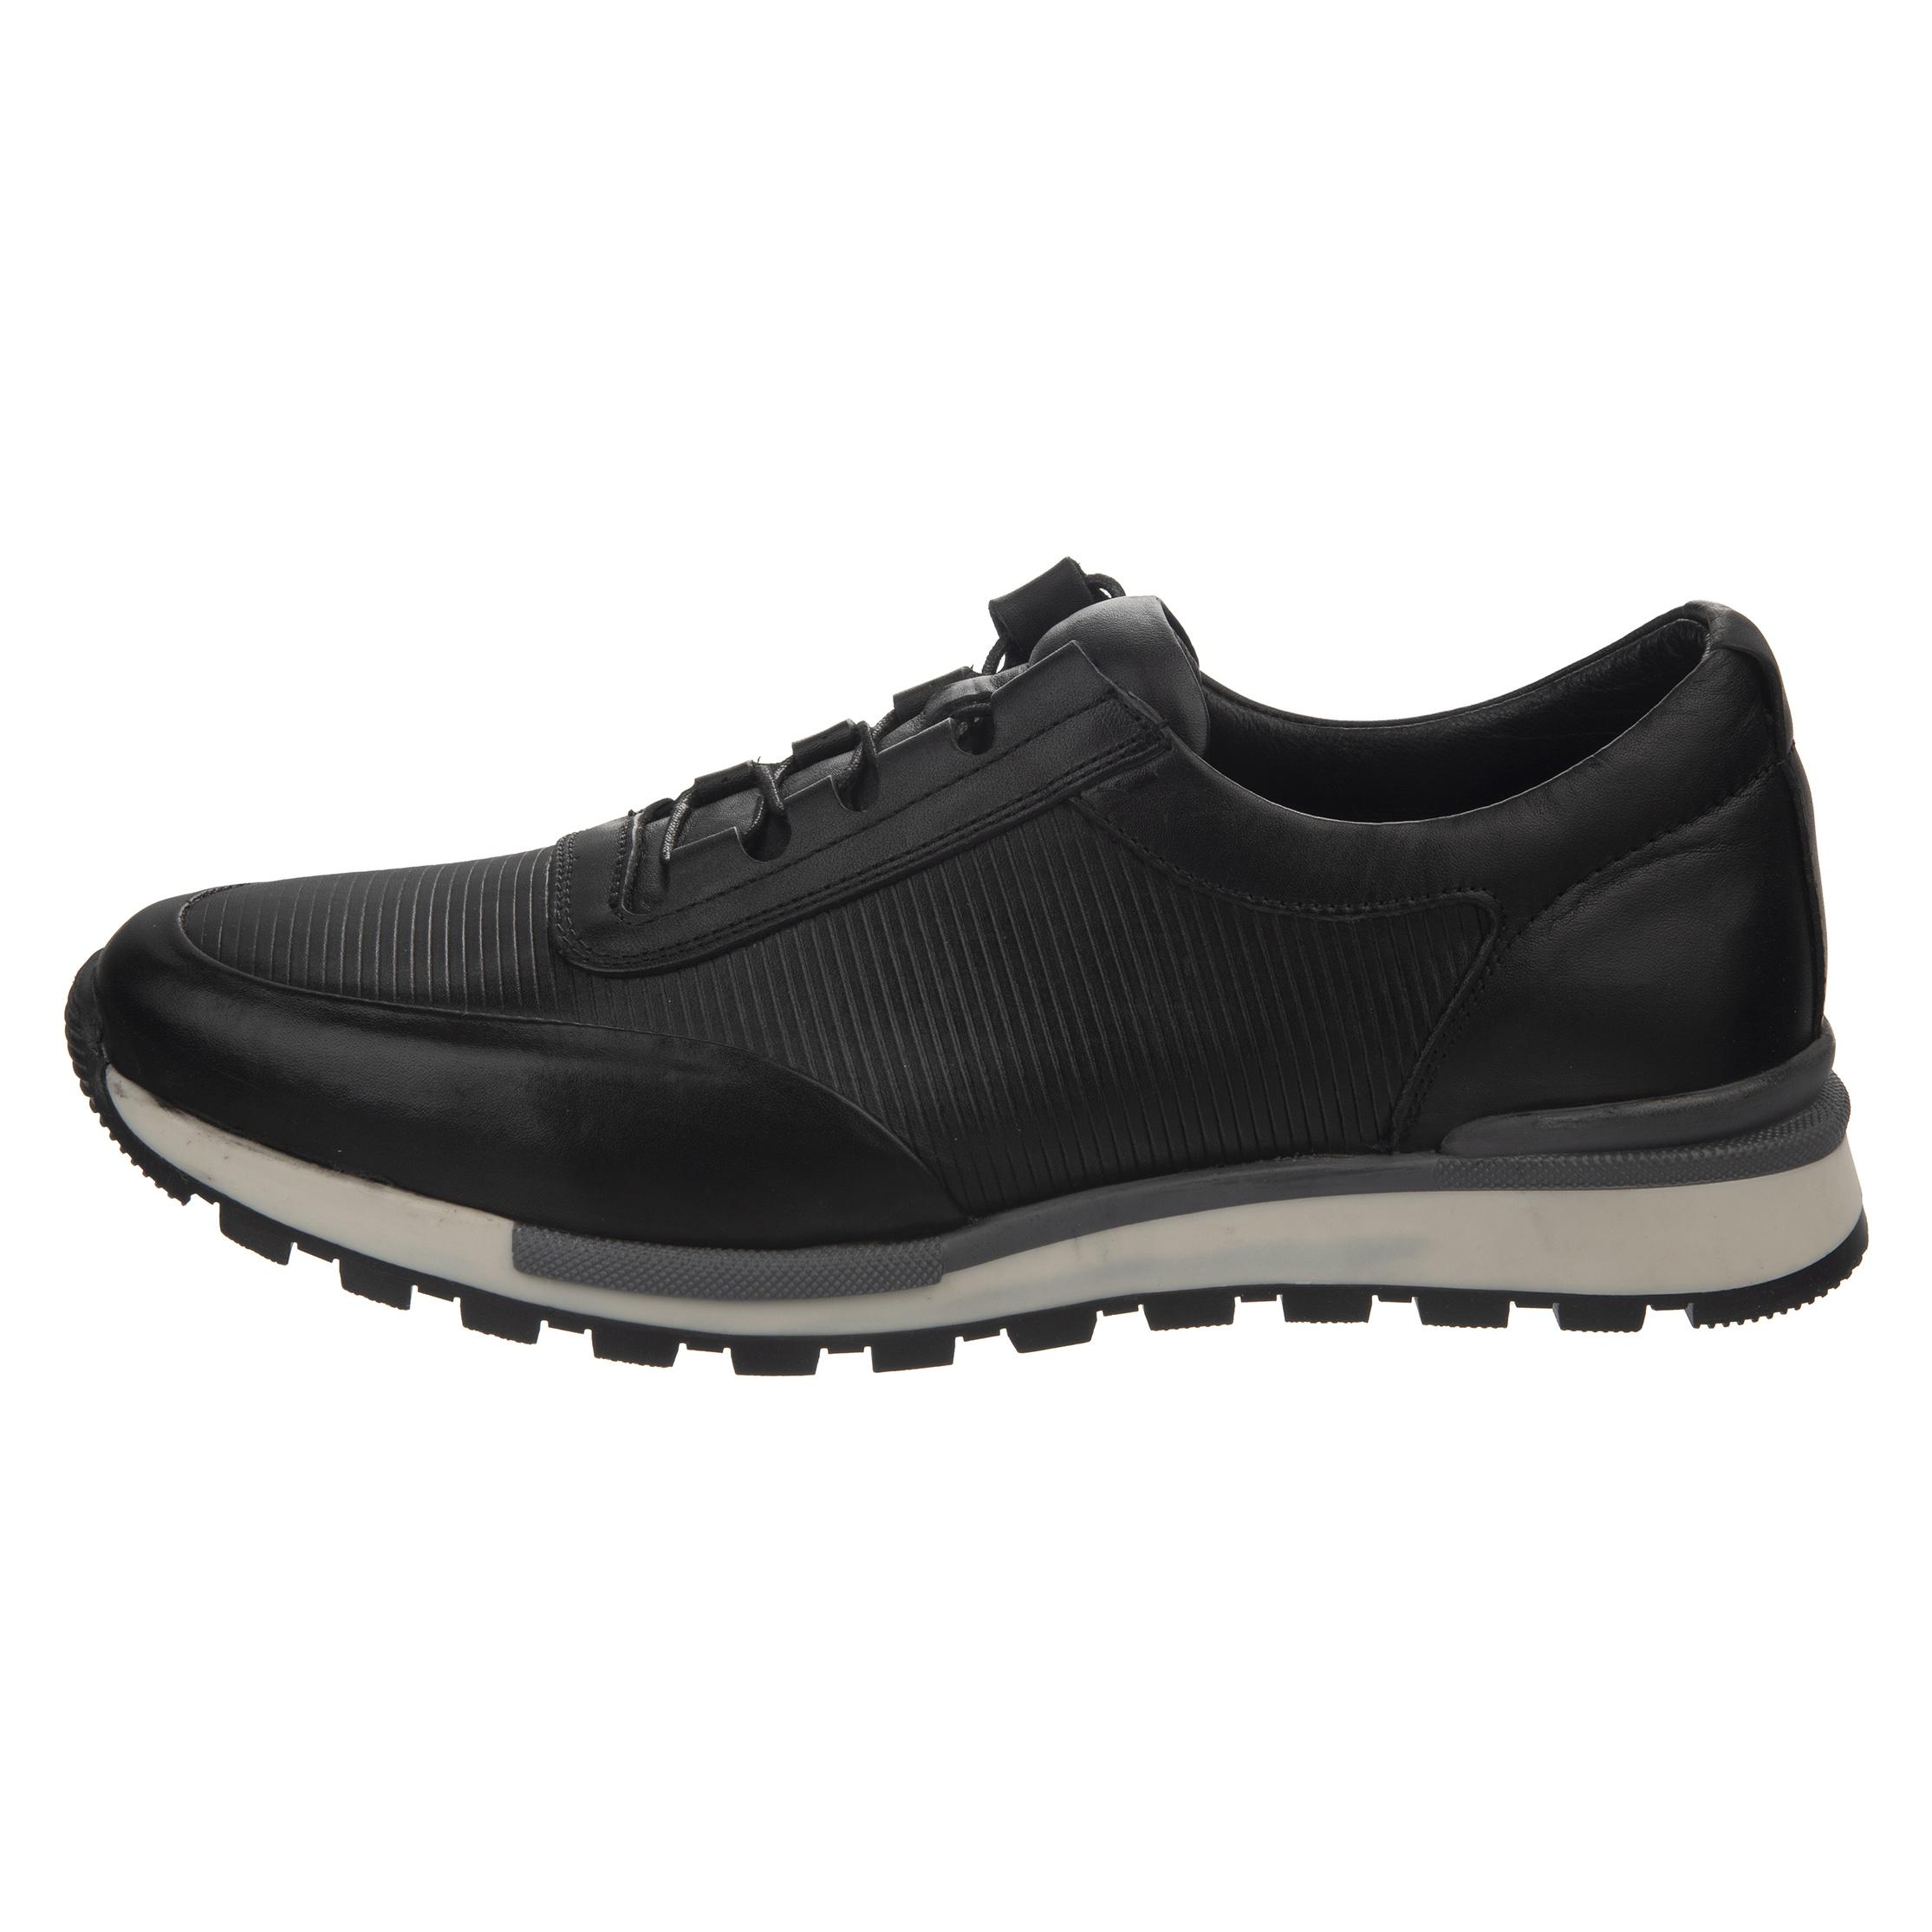 کفش روزمره مردانه شیفر مدل 7246A-101